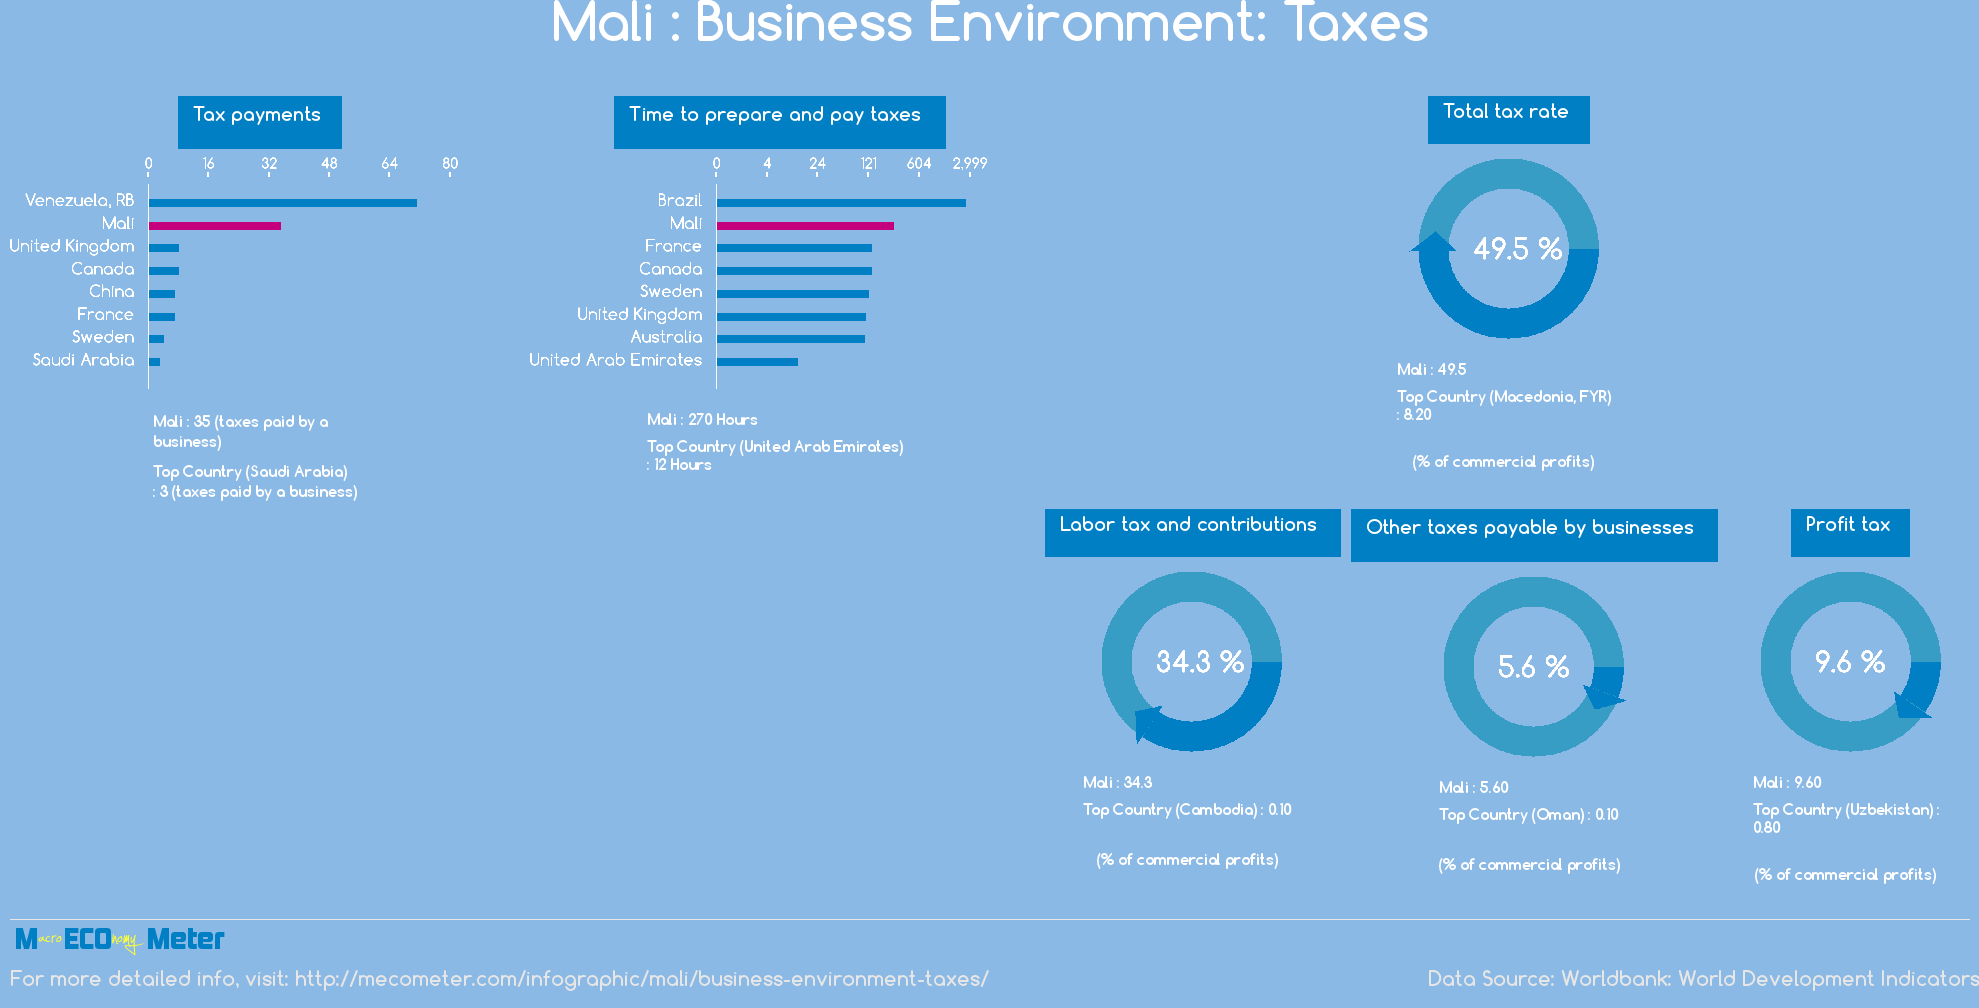 Mali : Business Environment: Taxes